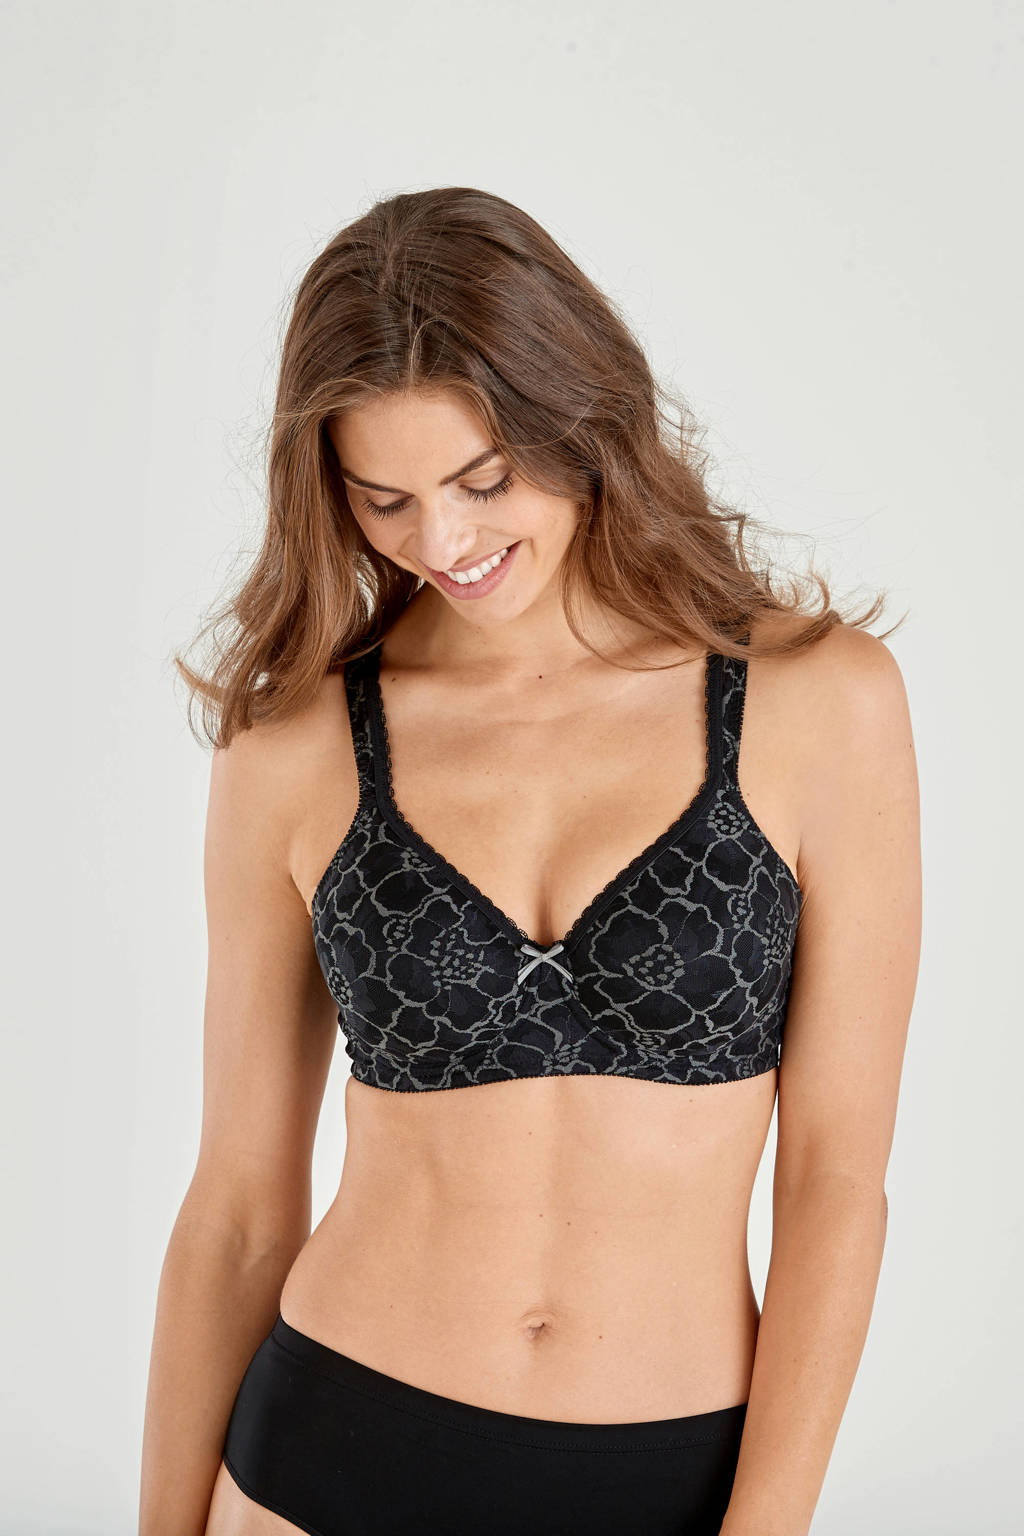 Swegmark voorgevormde beugelbh Lace Shape zwart, Zwart